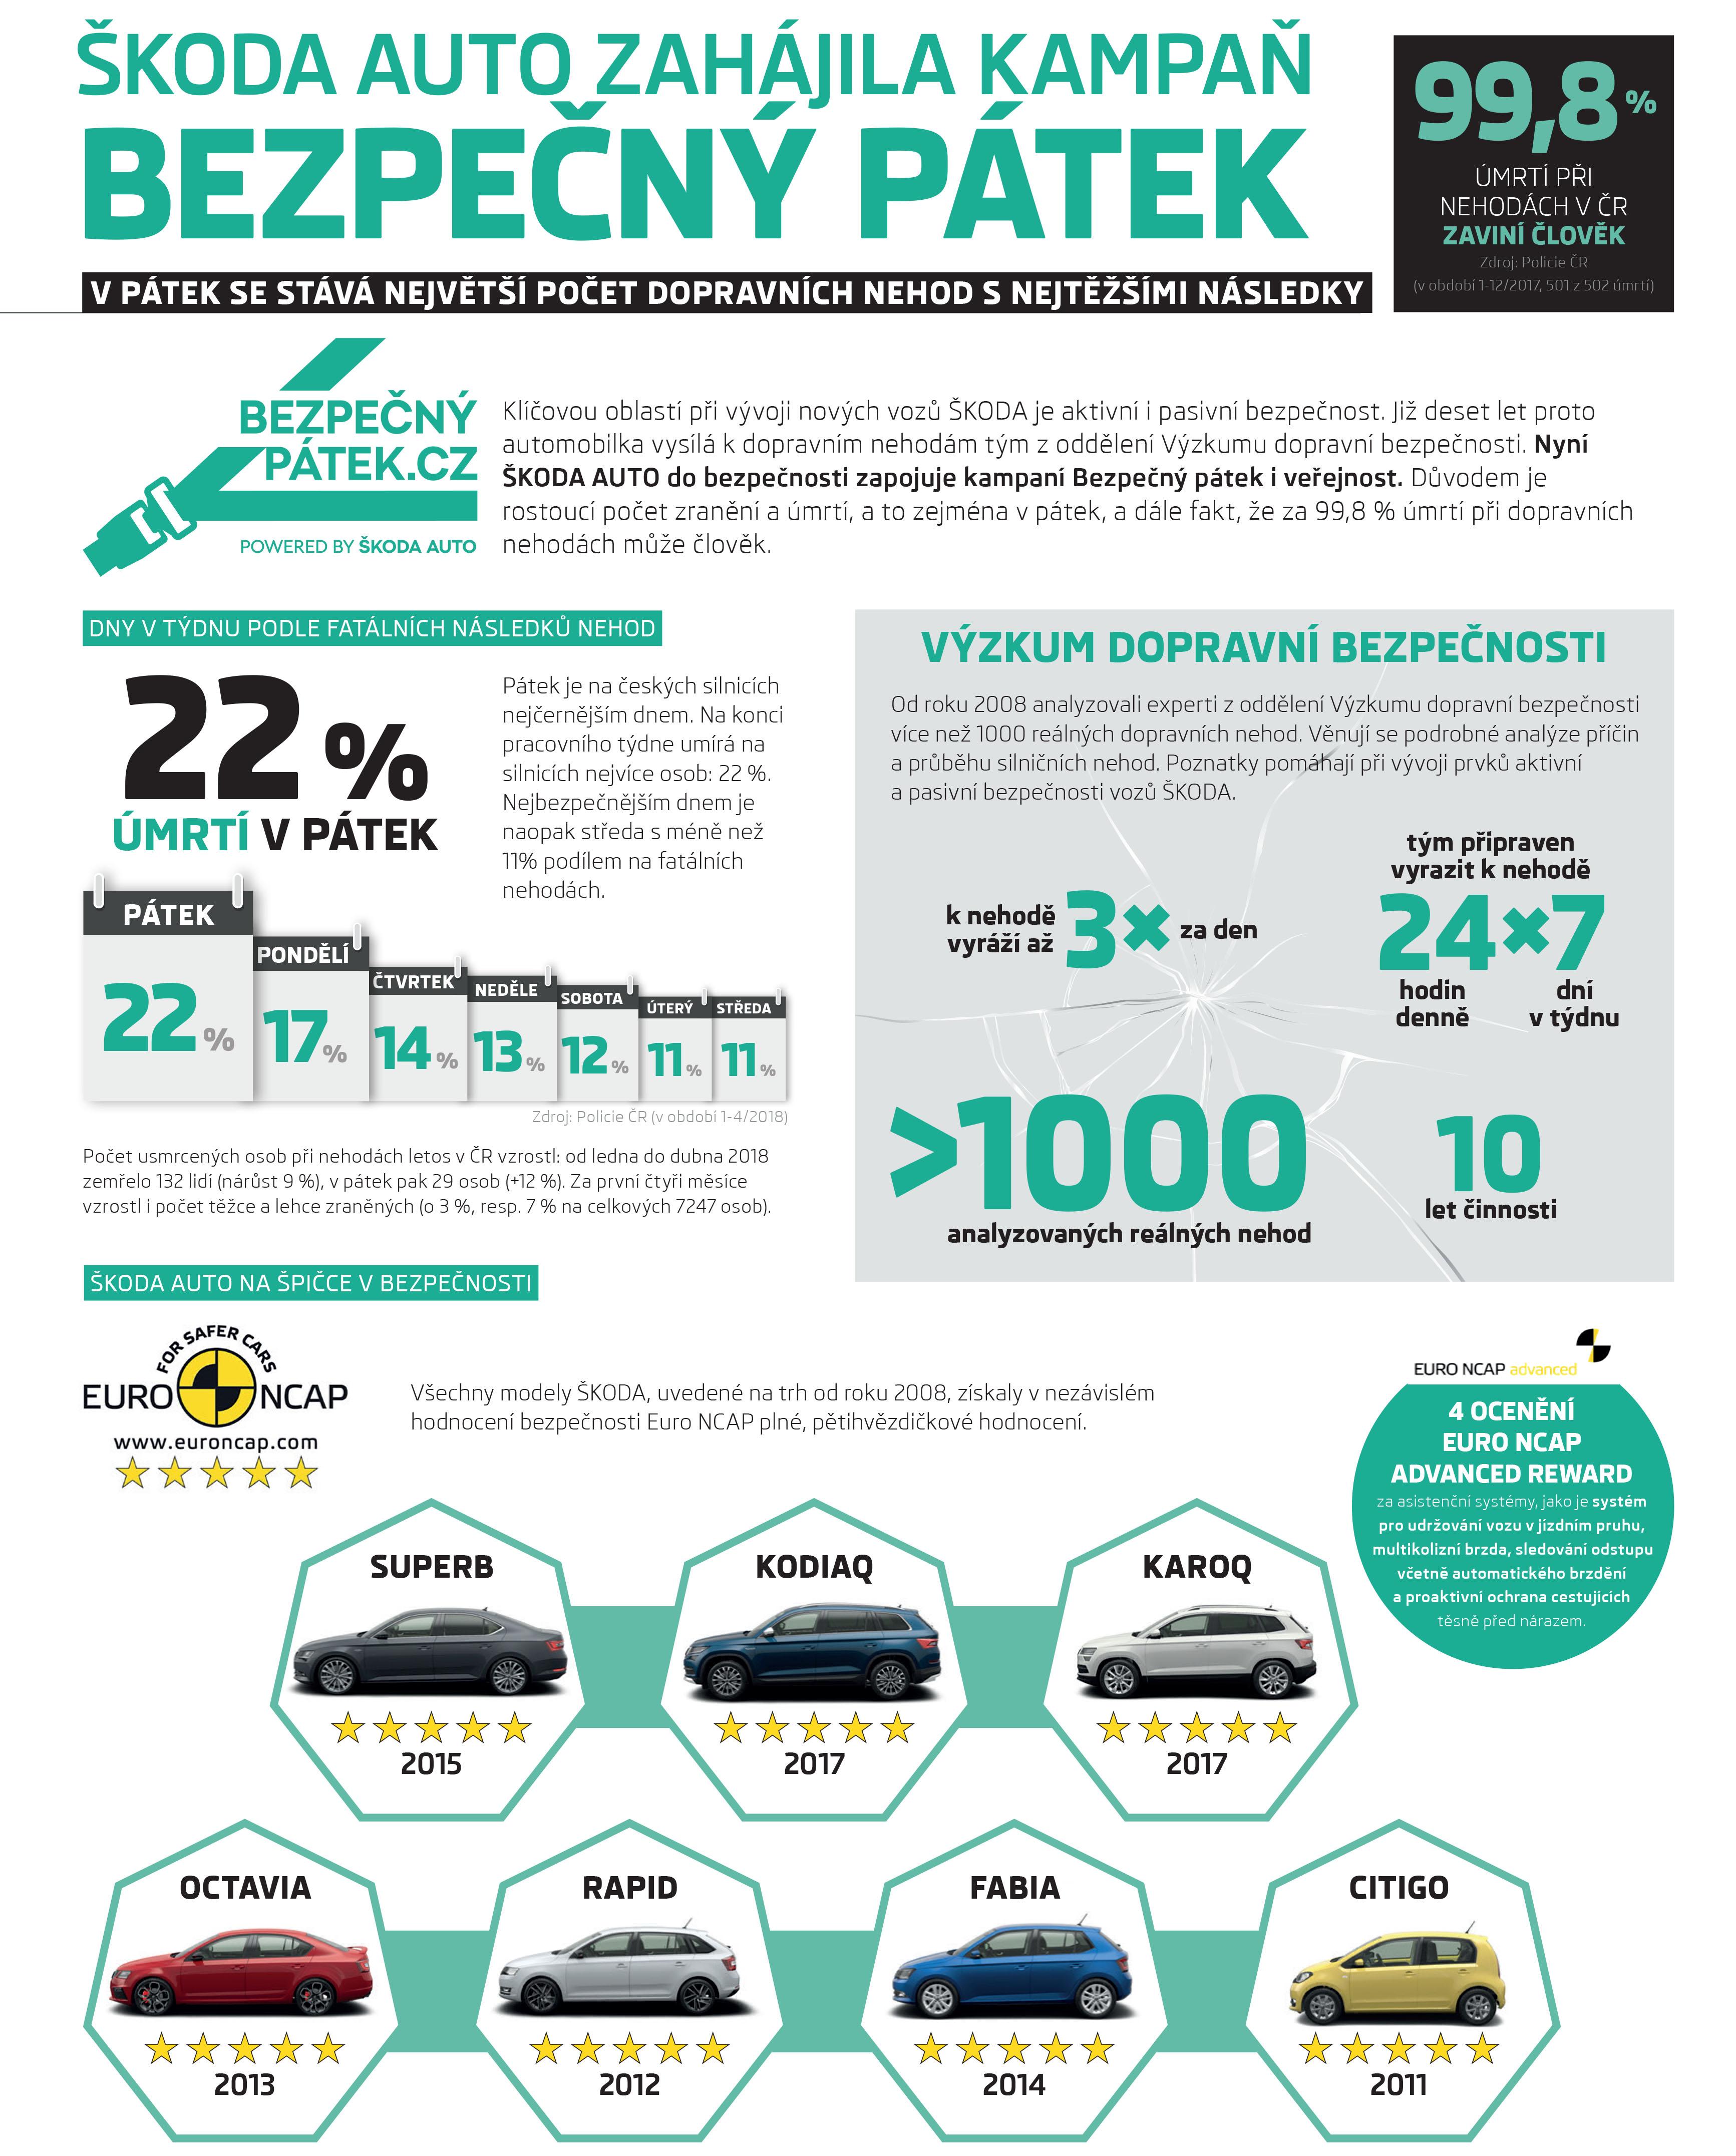 Infografika: ŠKODA AUTO zahájila kampaň Bezpečný pátek